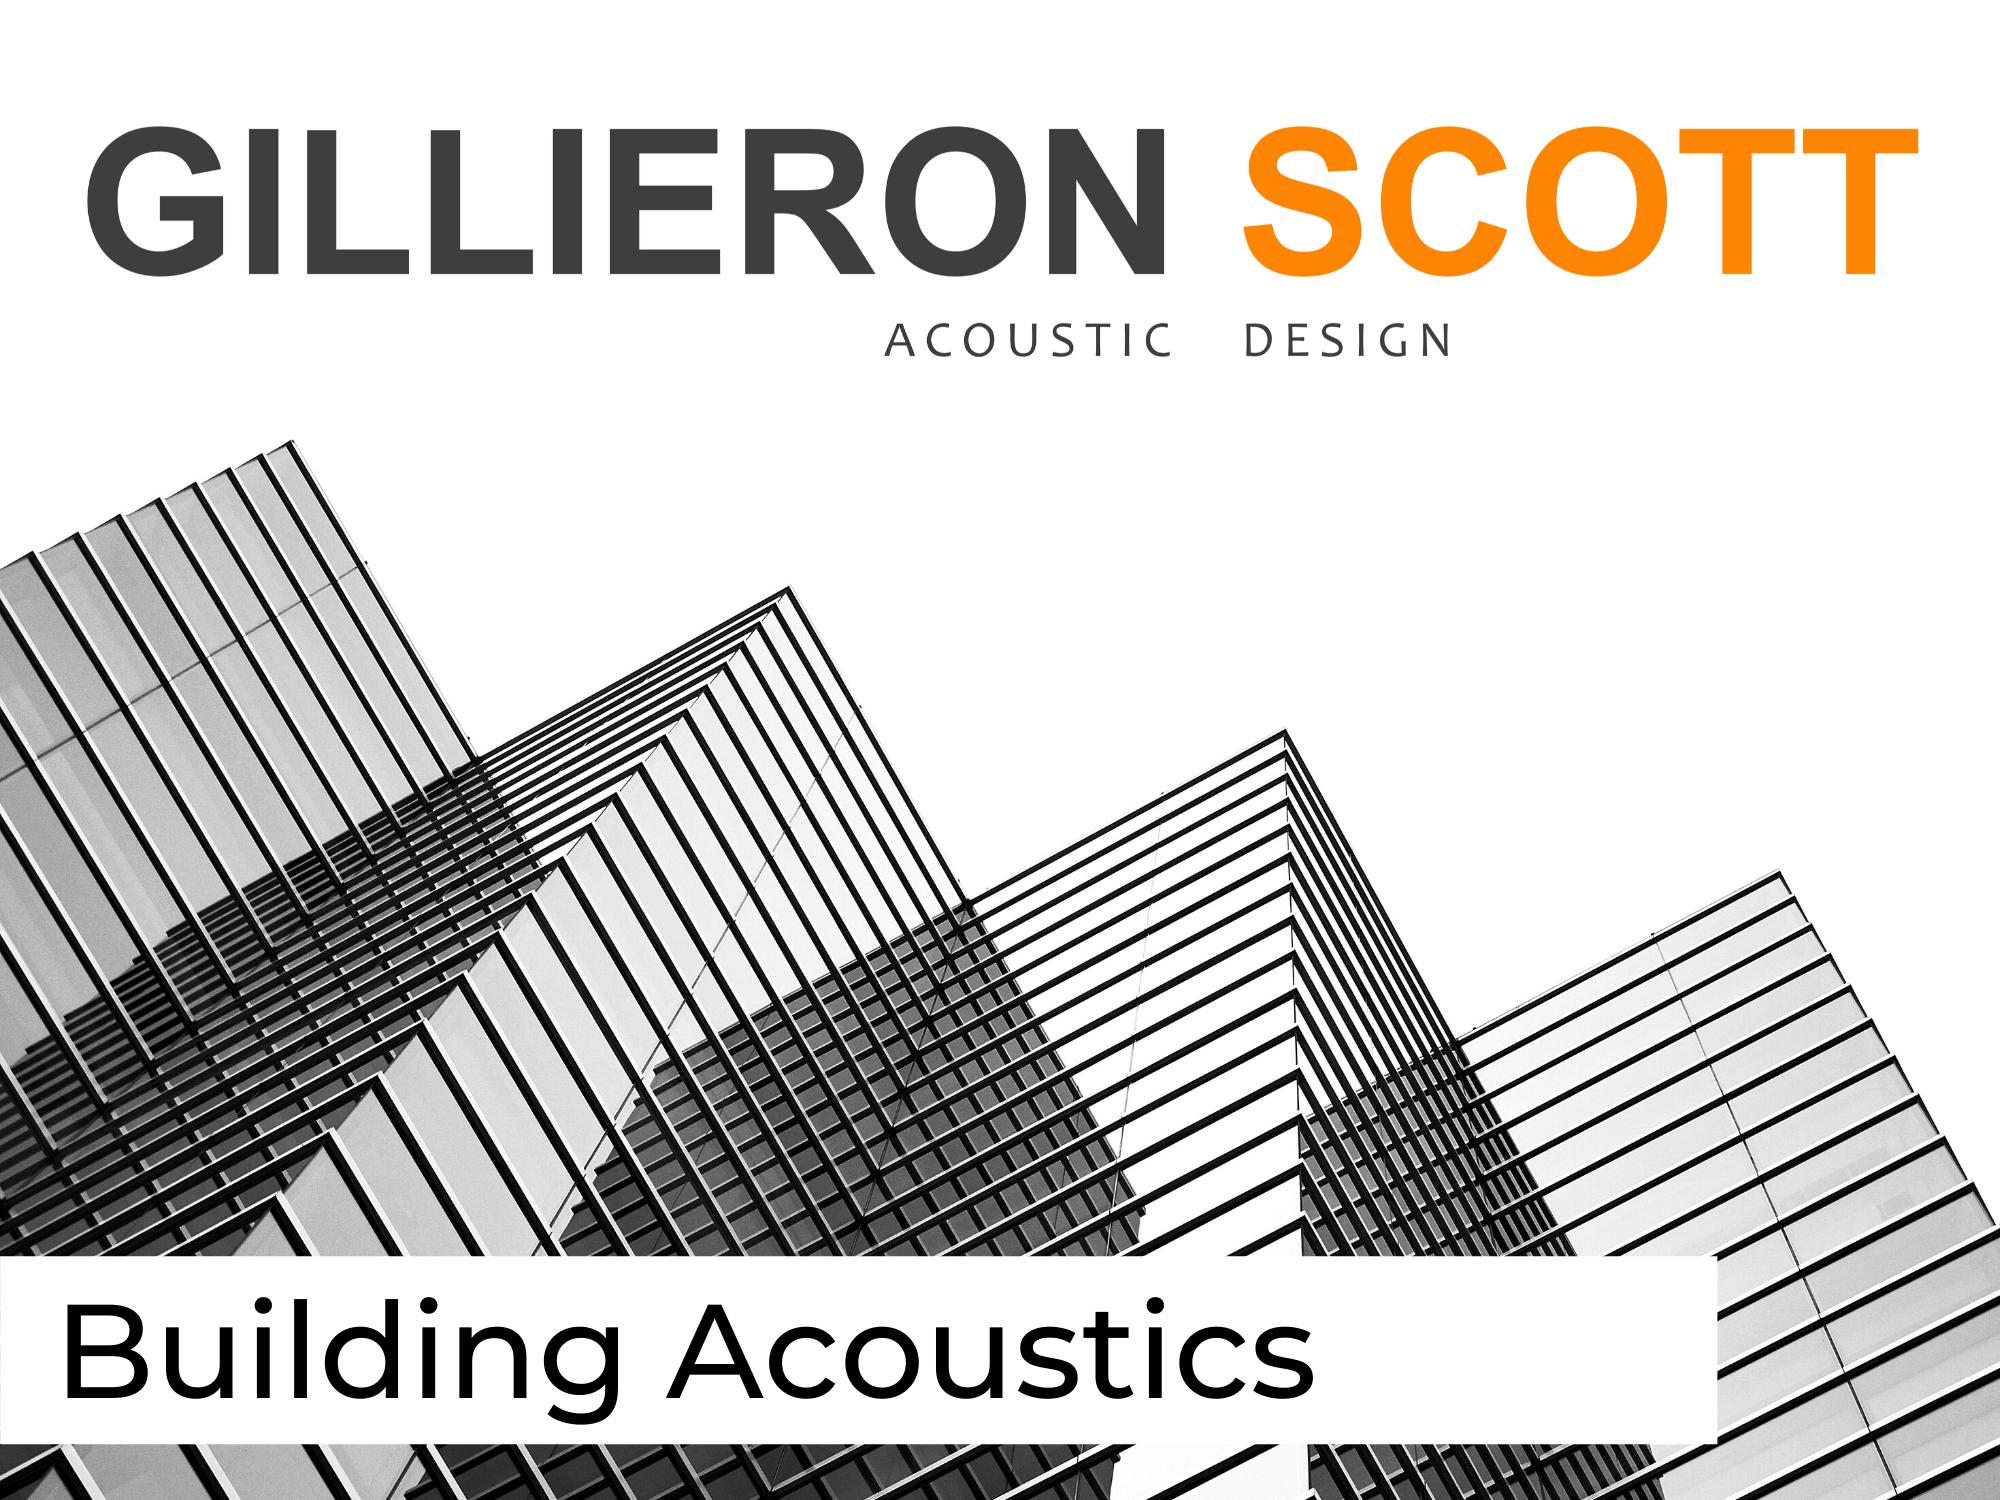 Building Acoustics Acoustic Consulting Services London